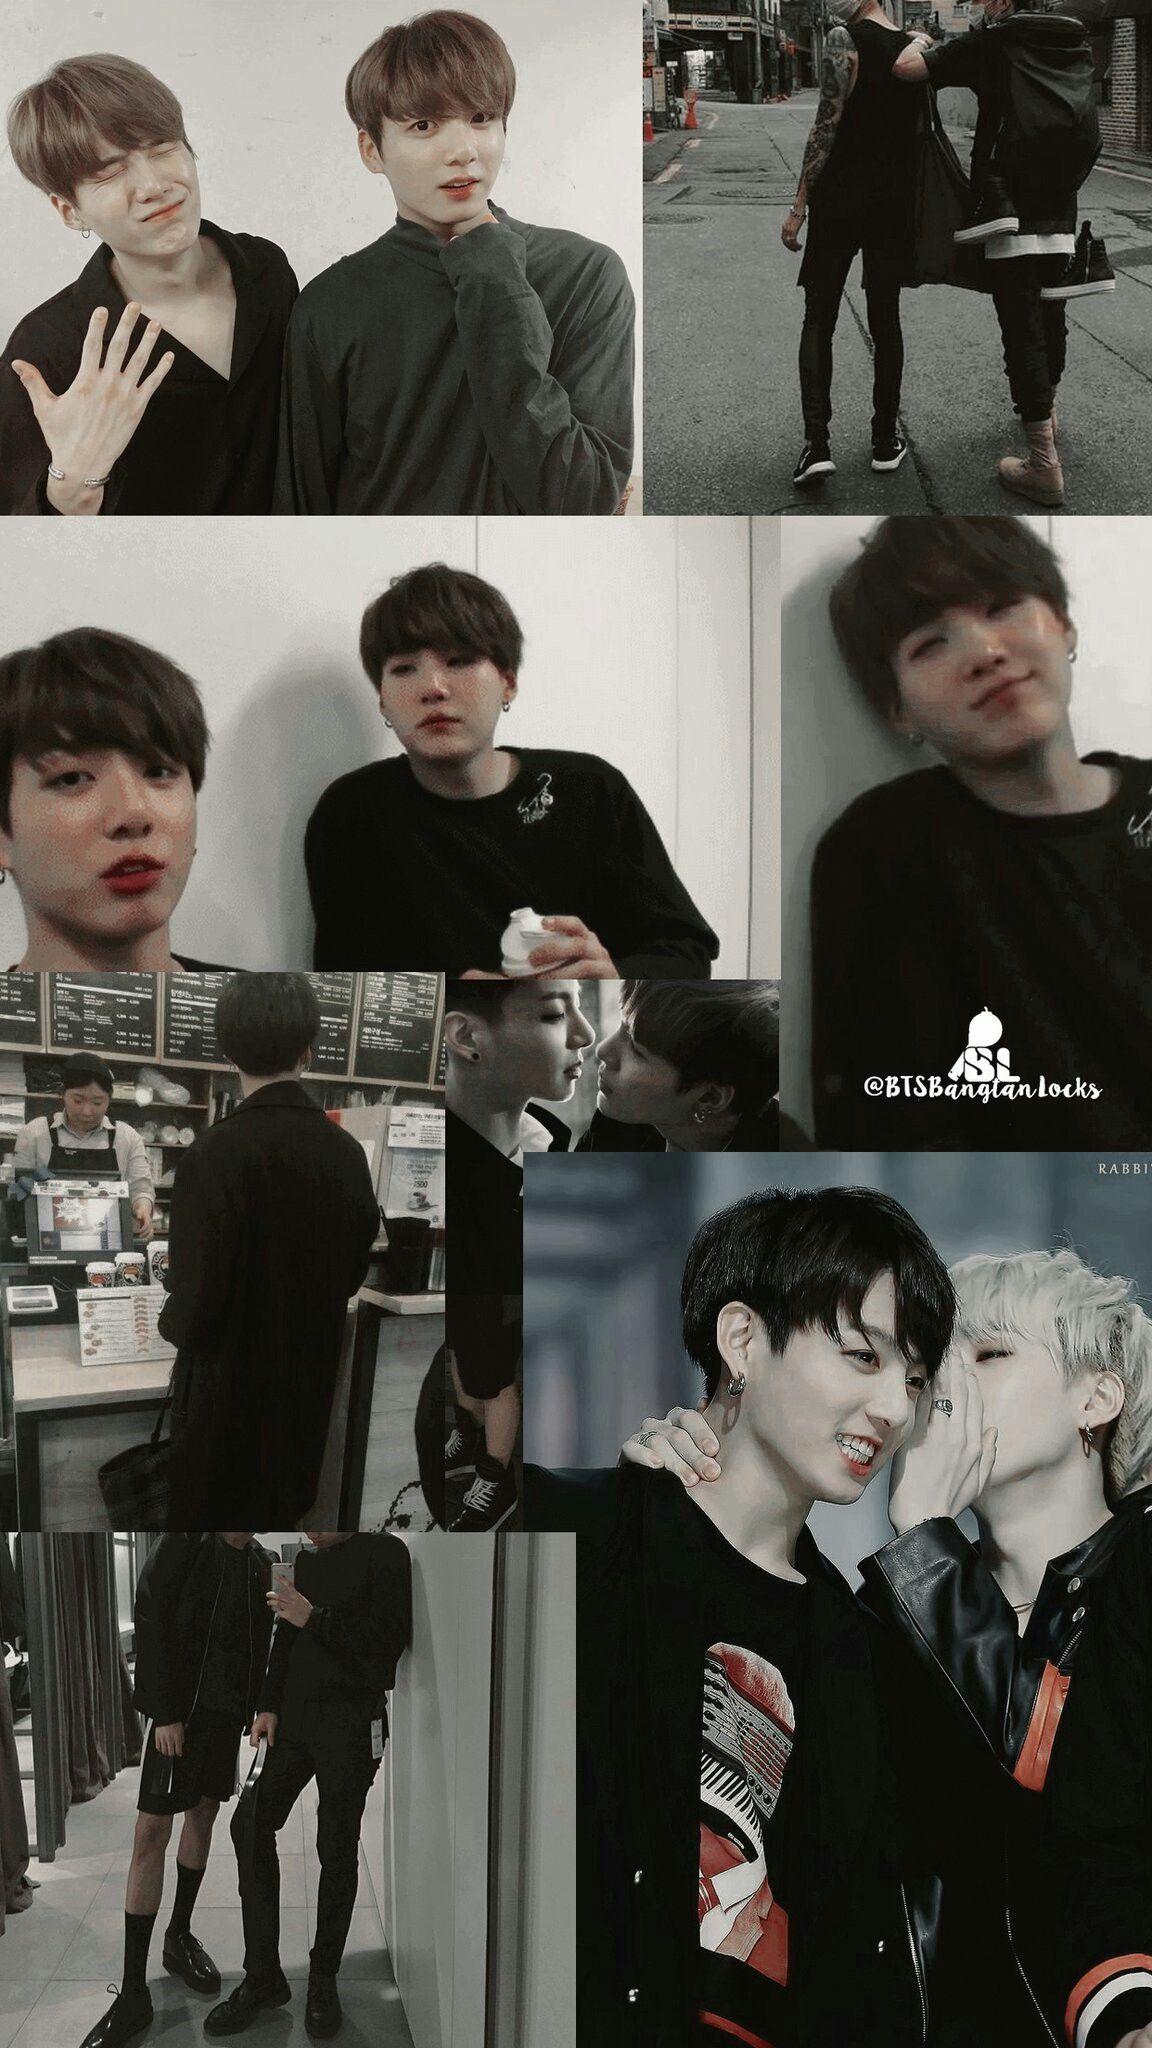 Yoonkook Wallpaper Bts Boys Bts Photo Bts Pictures Bts wallpaper yoonkook lockscreen